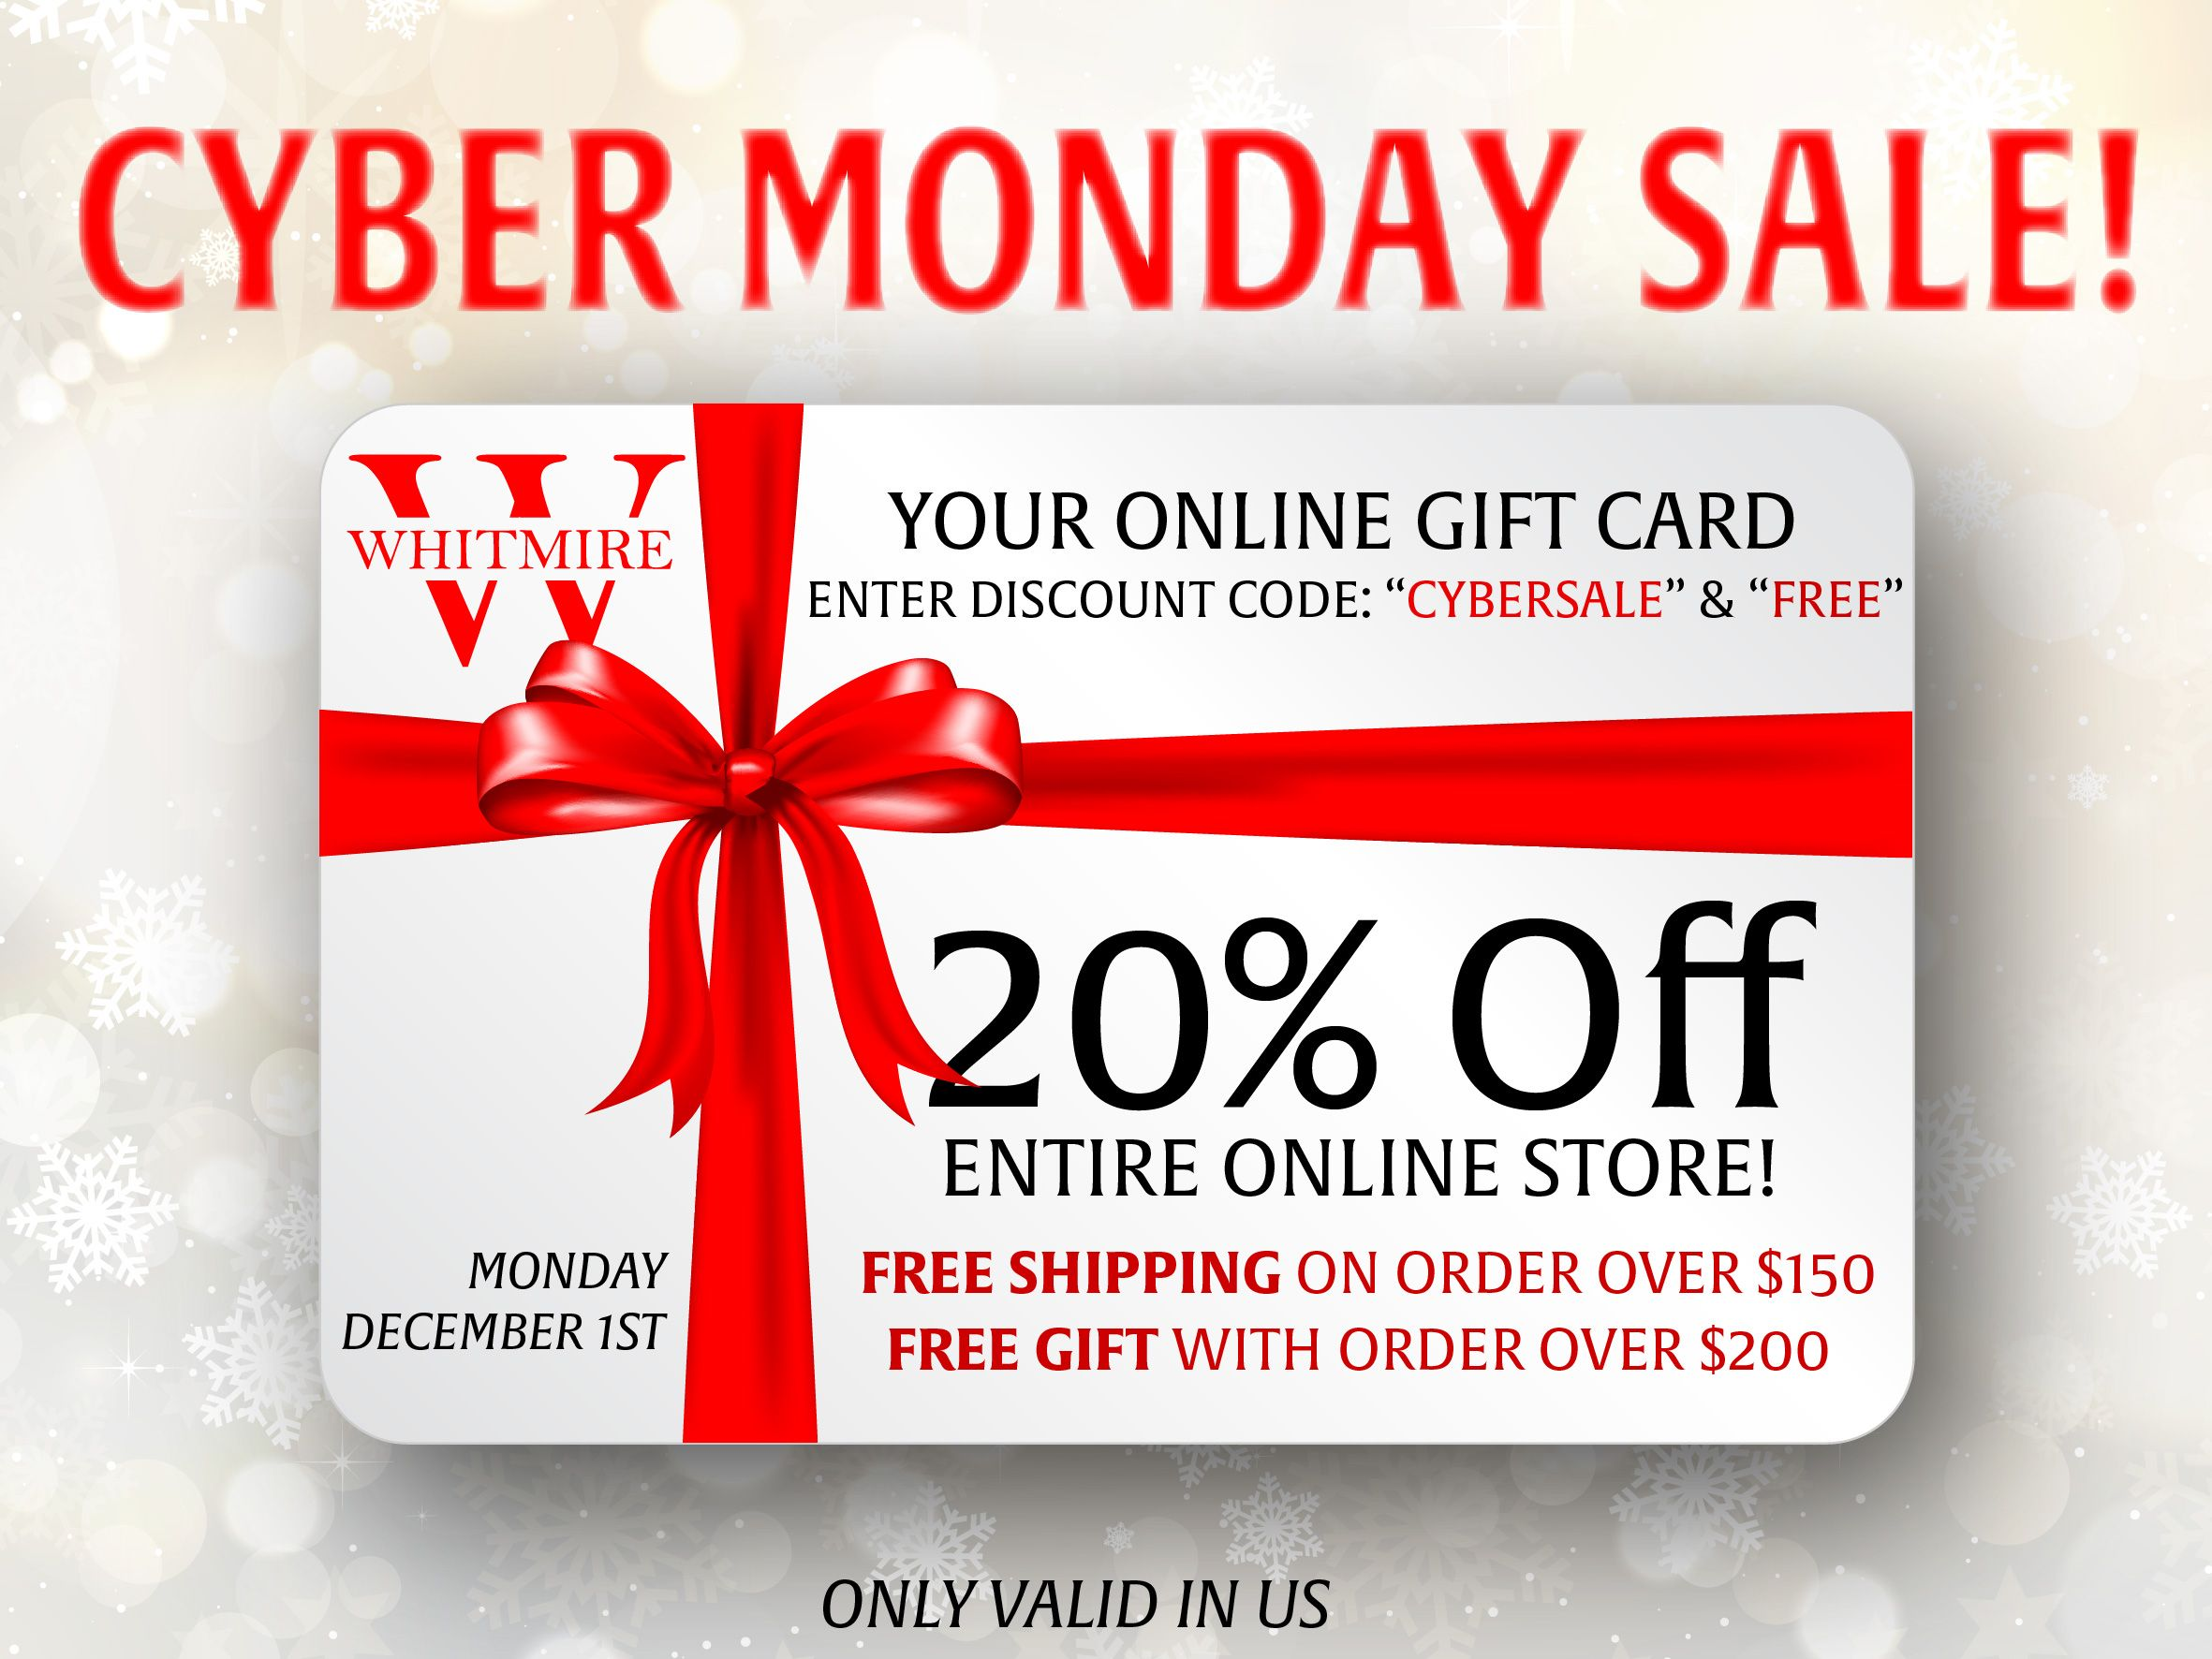 Cybermonday Cybermondaysale Jewelrysale Cybersale Blackfriday Jewelry Online Gift Cards Cyber Monday Sales Free Gifts